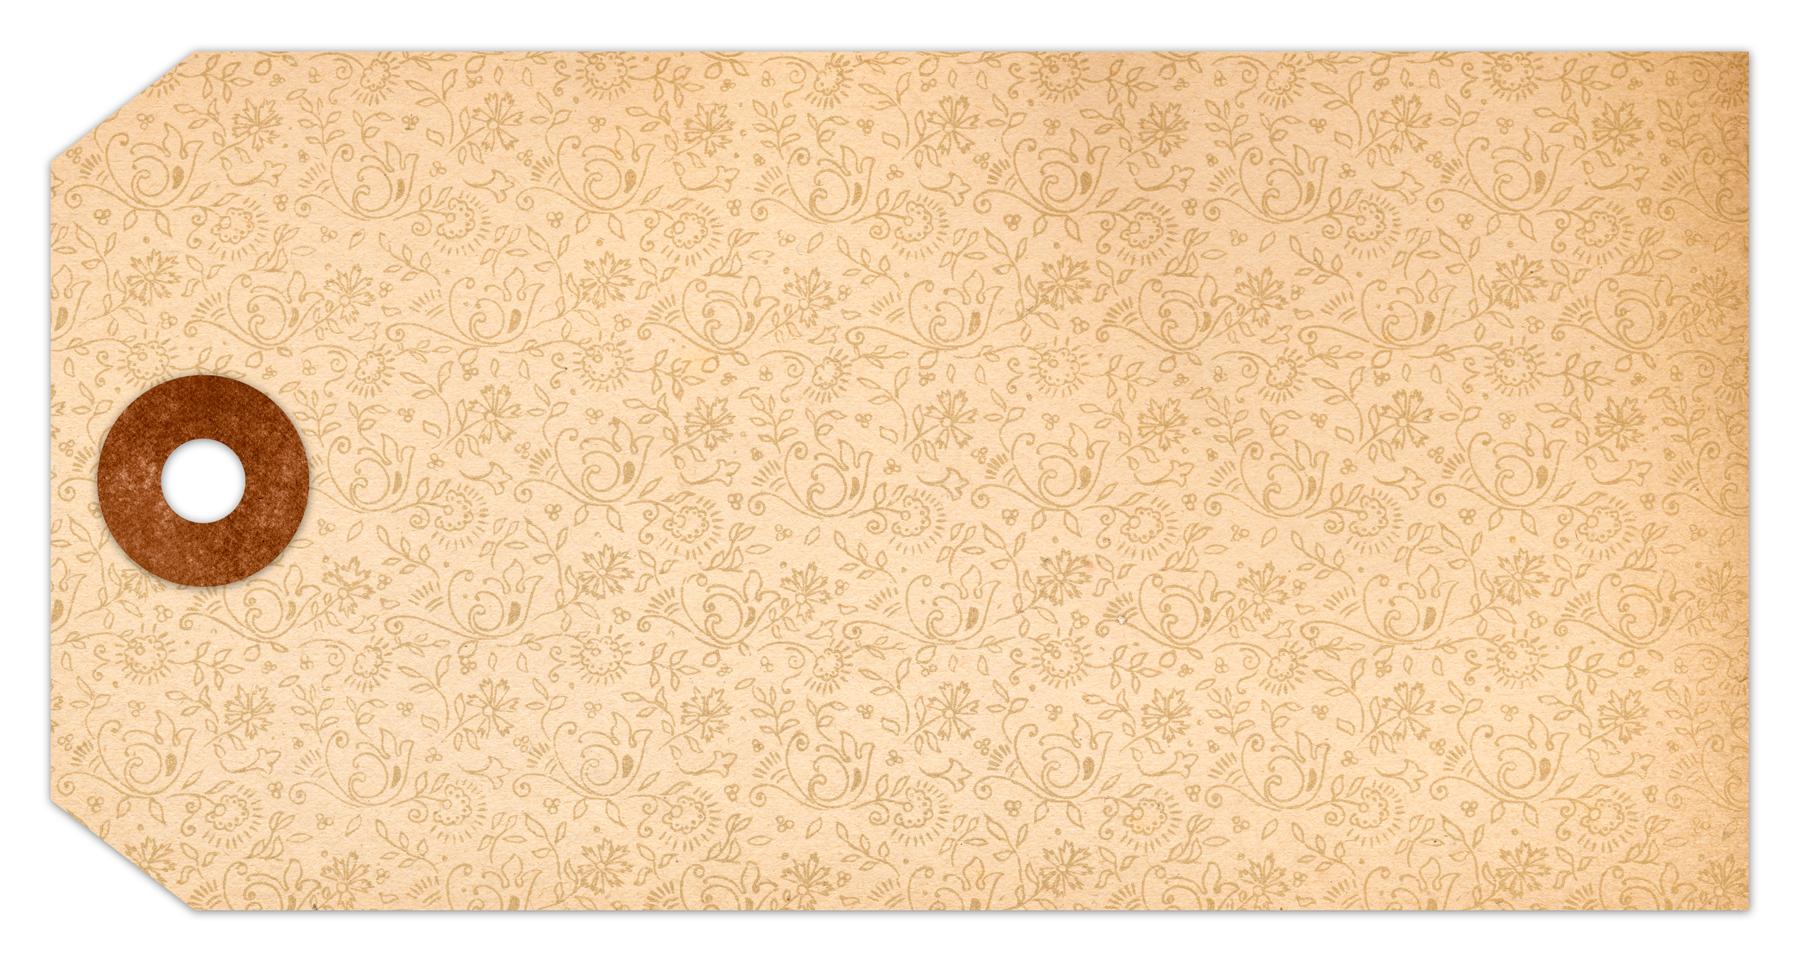 Vintage paper tag - flourish pattern photo